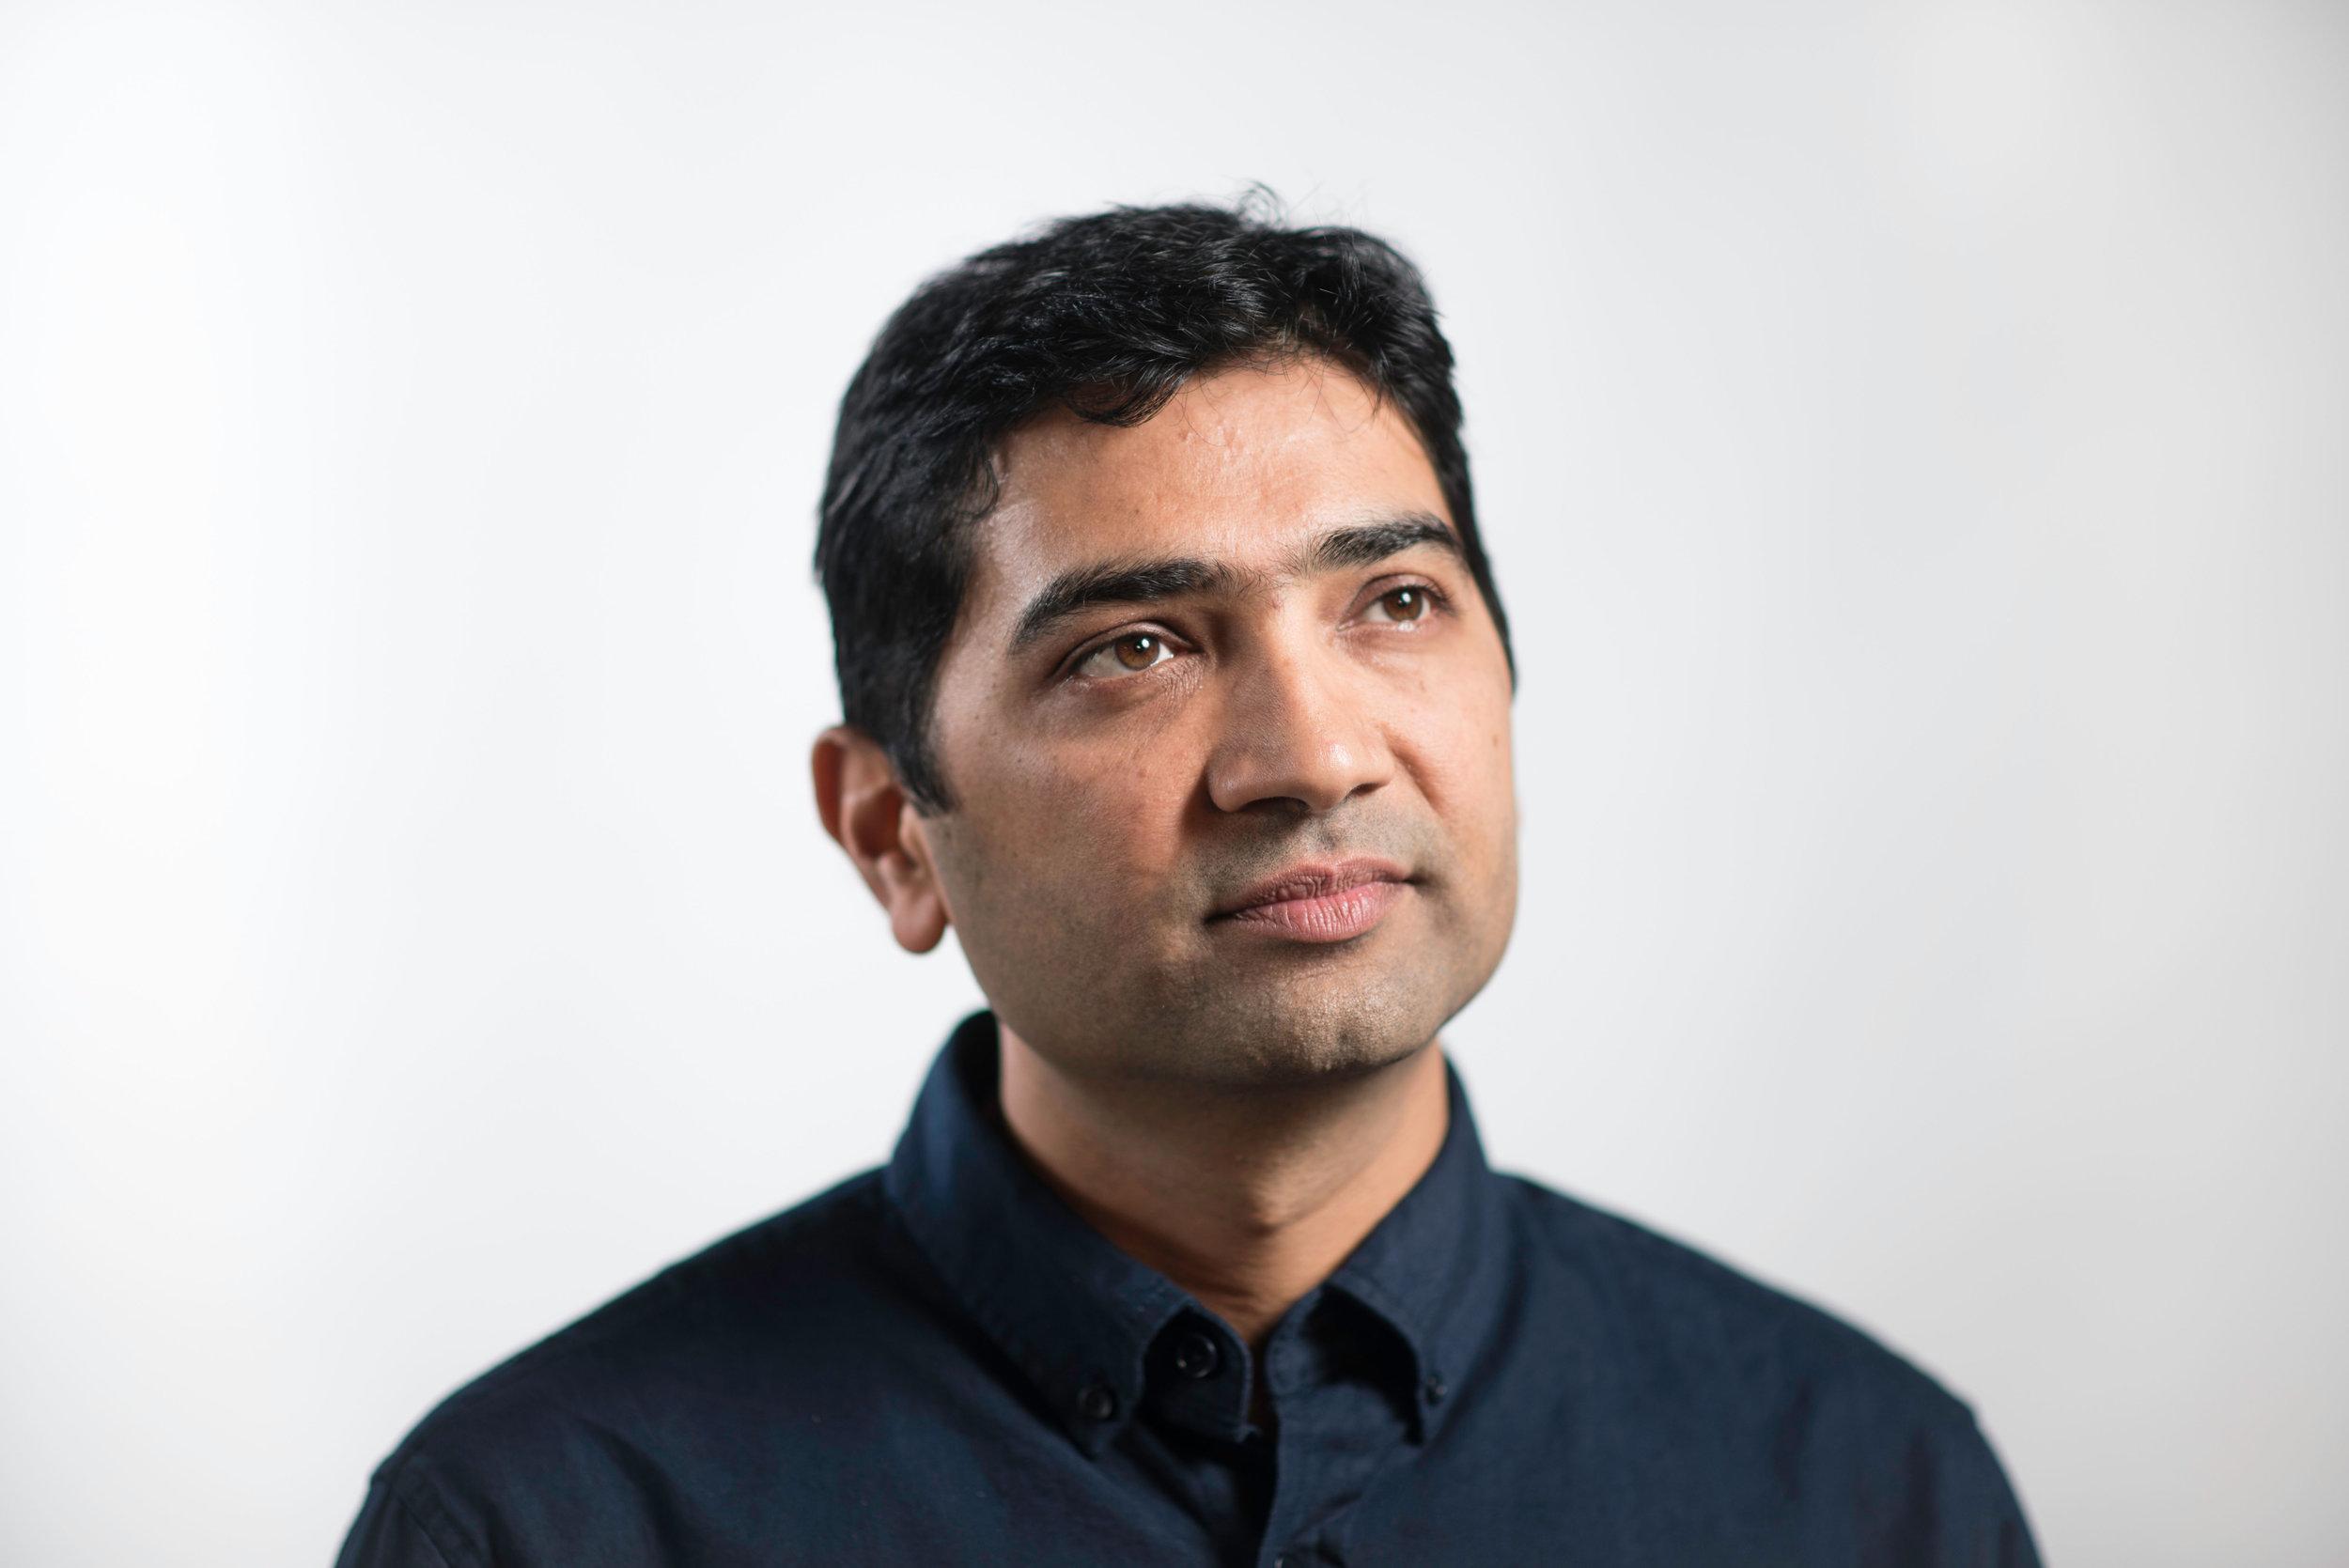 Gaurav Jain Headshot